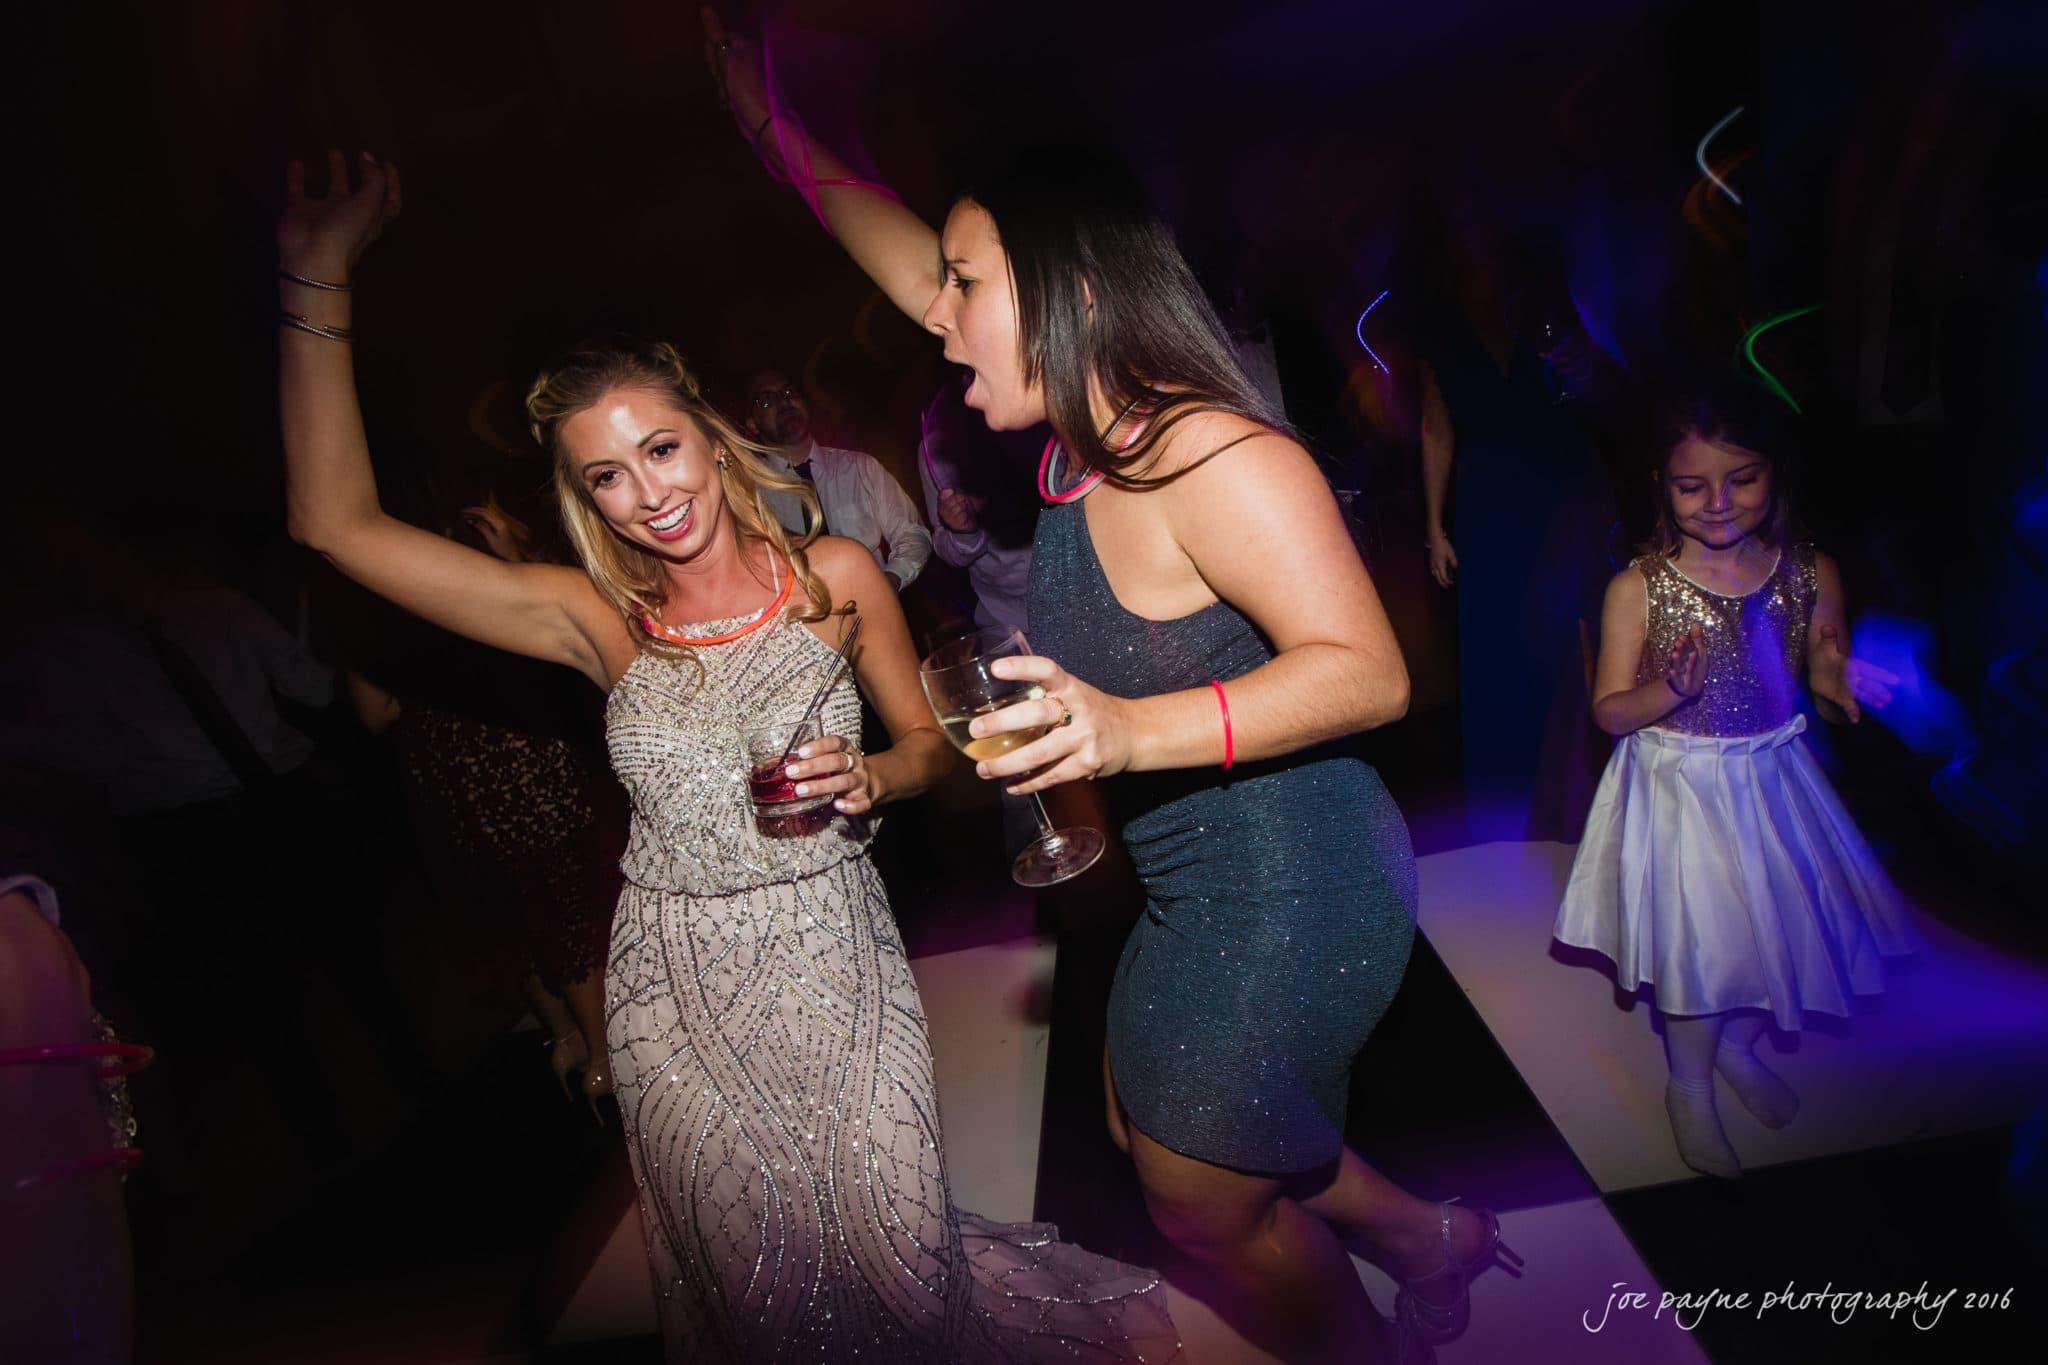 city-club-raleigh-wedding-photography-lauren-adam-52